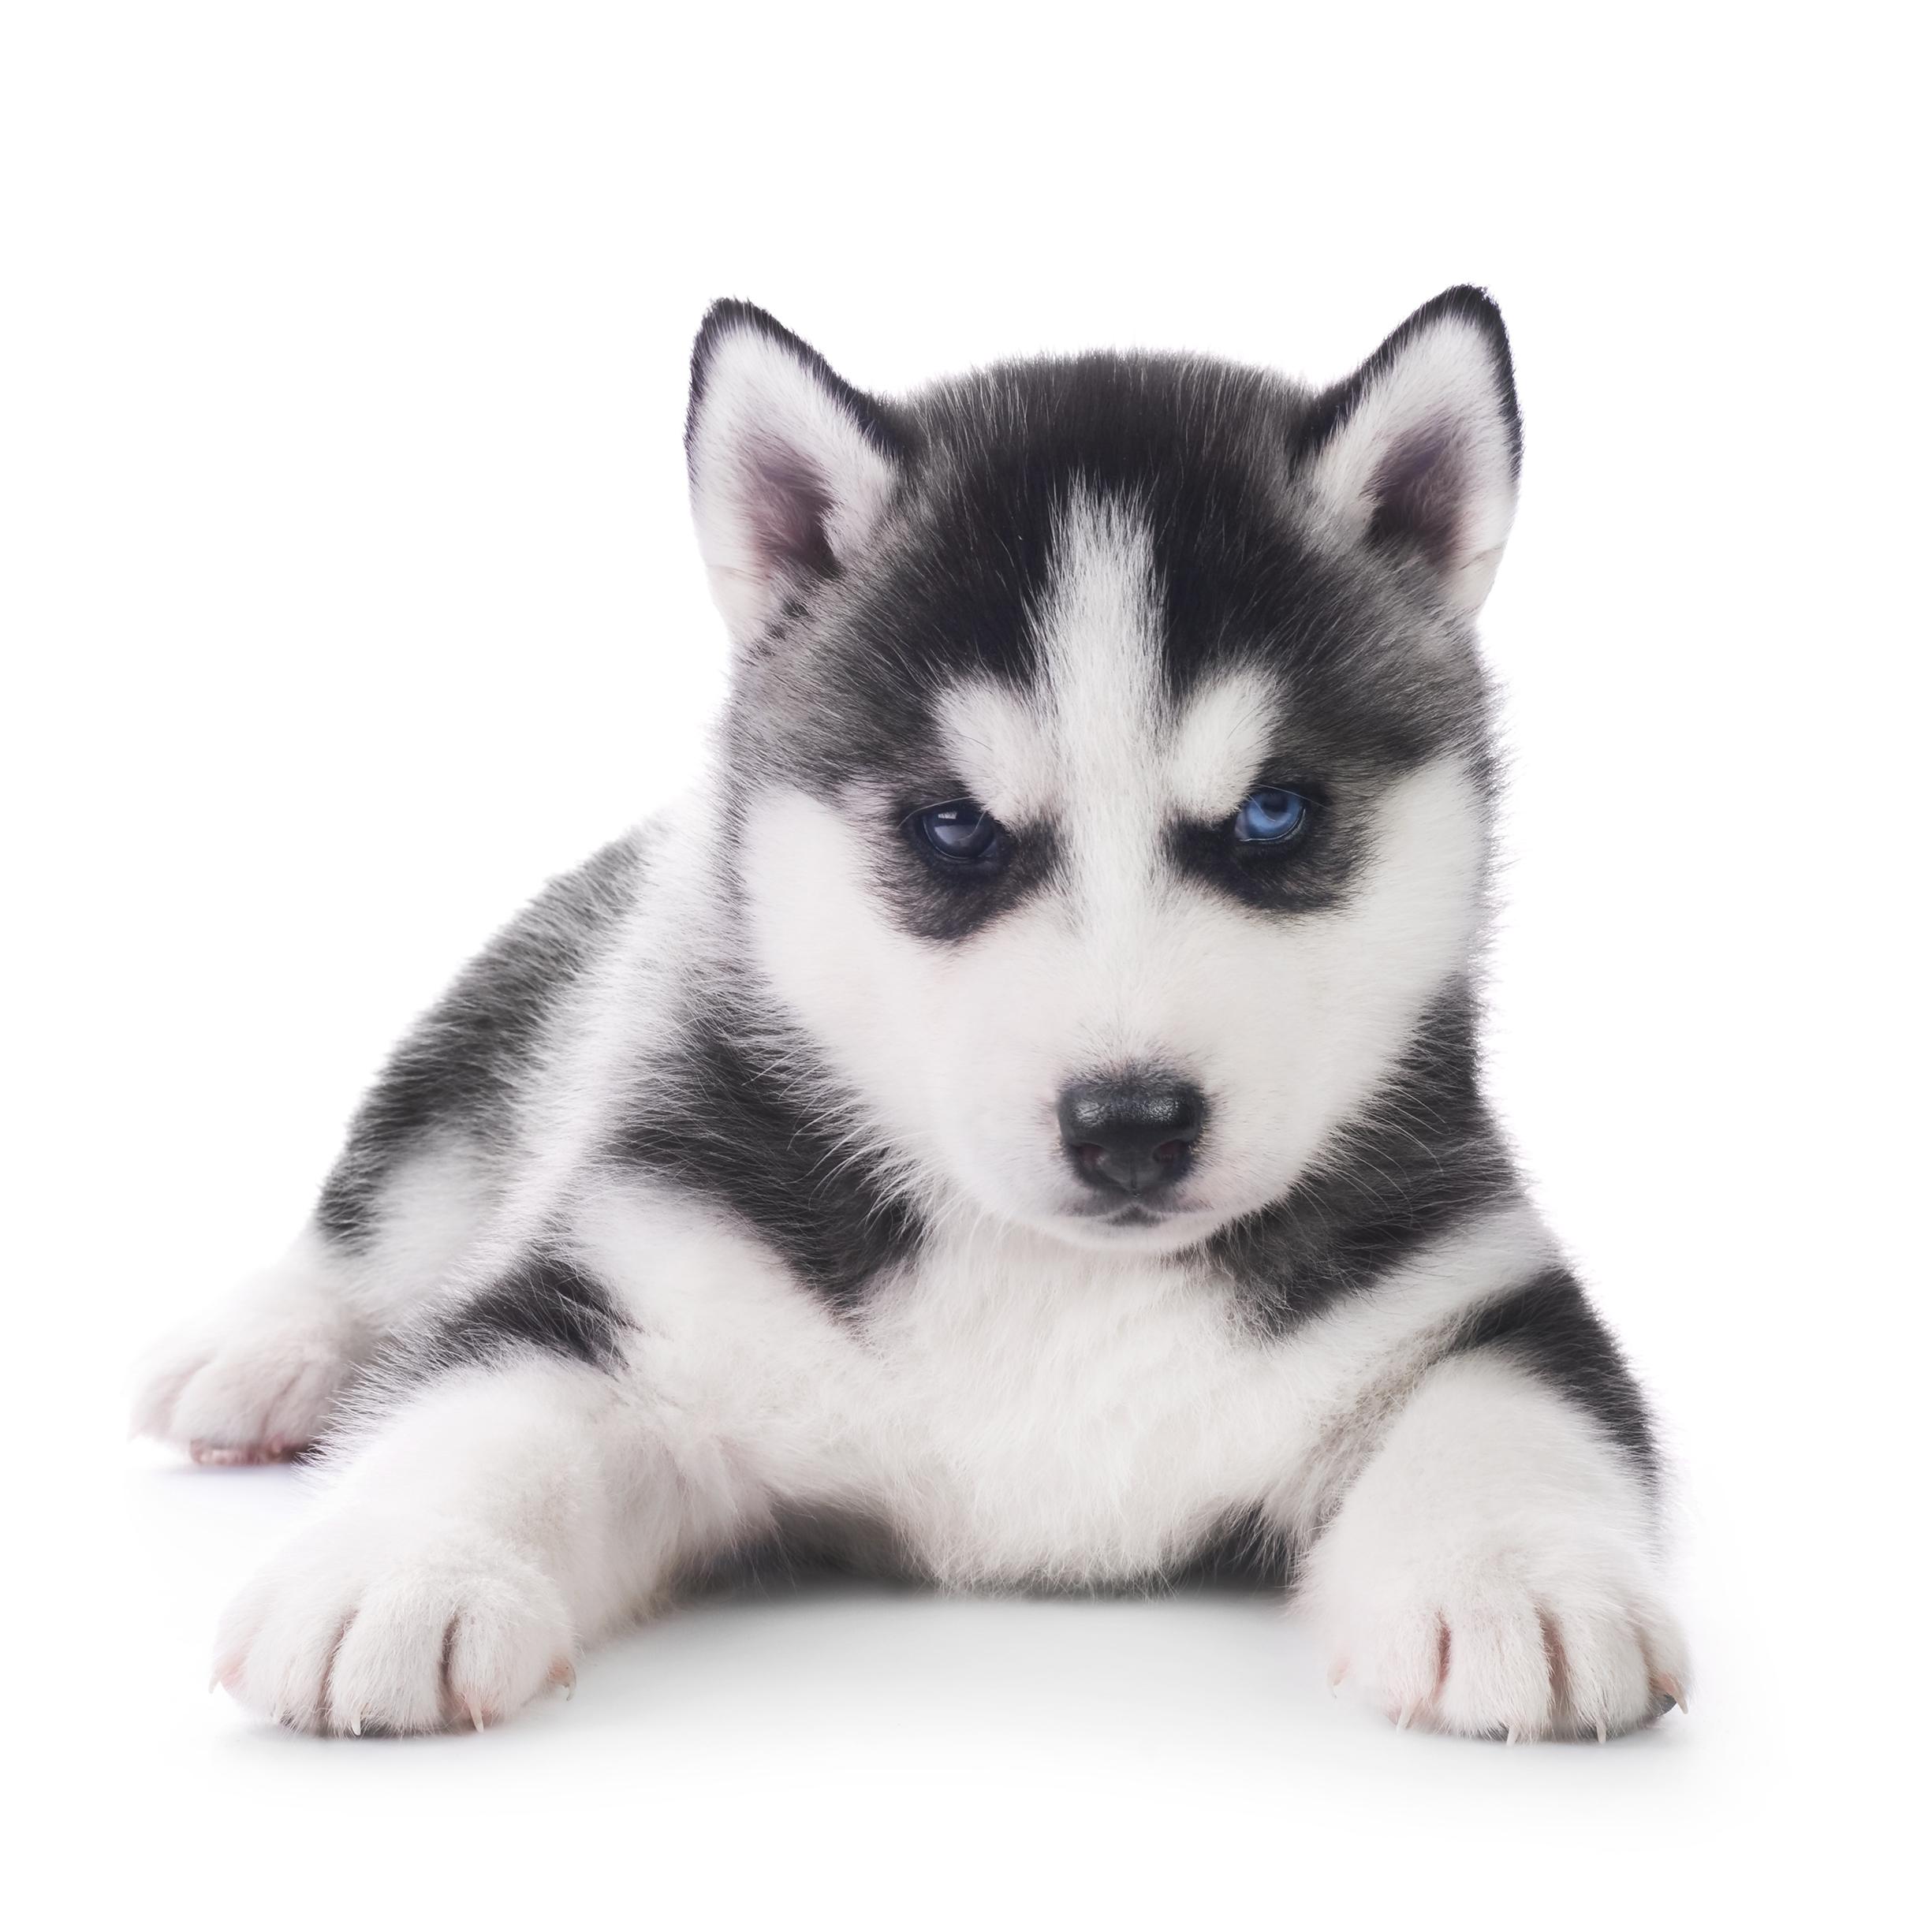 International Puppy Start Right Preschool classes seminars in Europe, Canada, Australia, Asia.